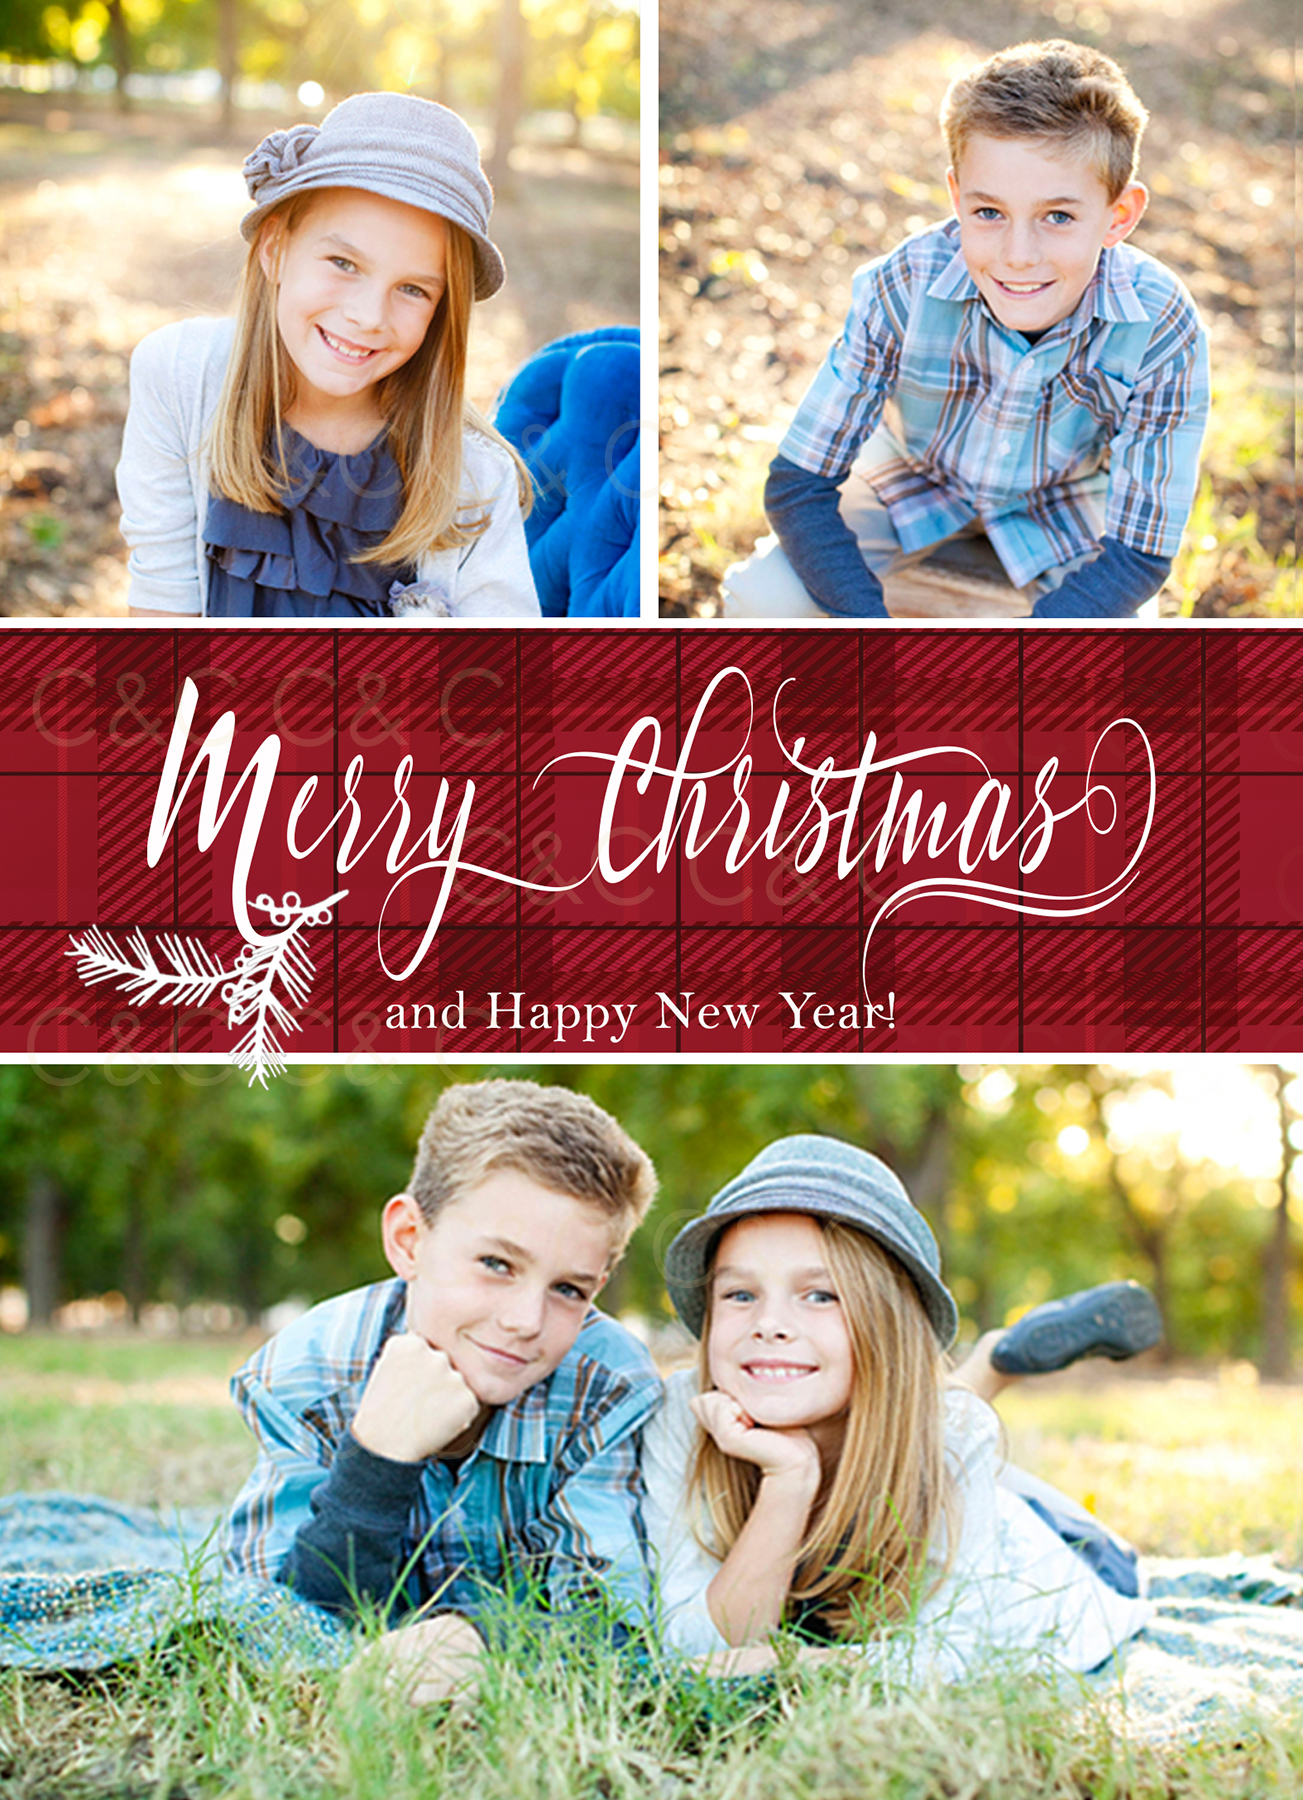 C&C Christmas Photo Card 18-04 example image 3